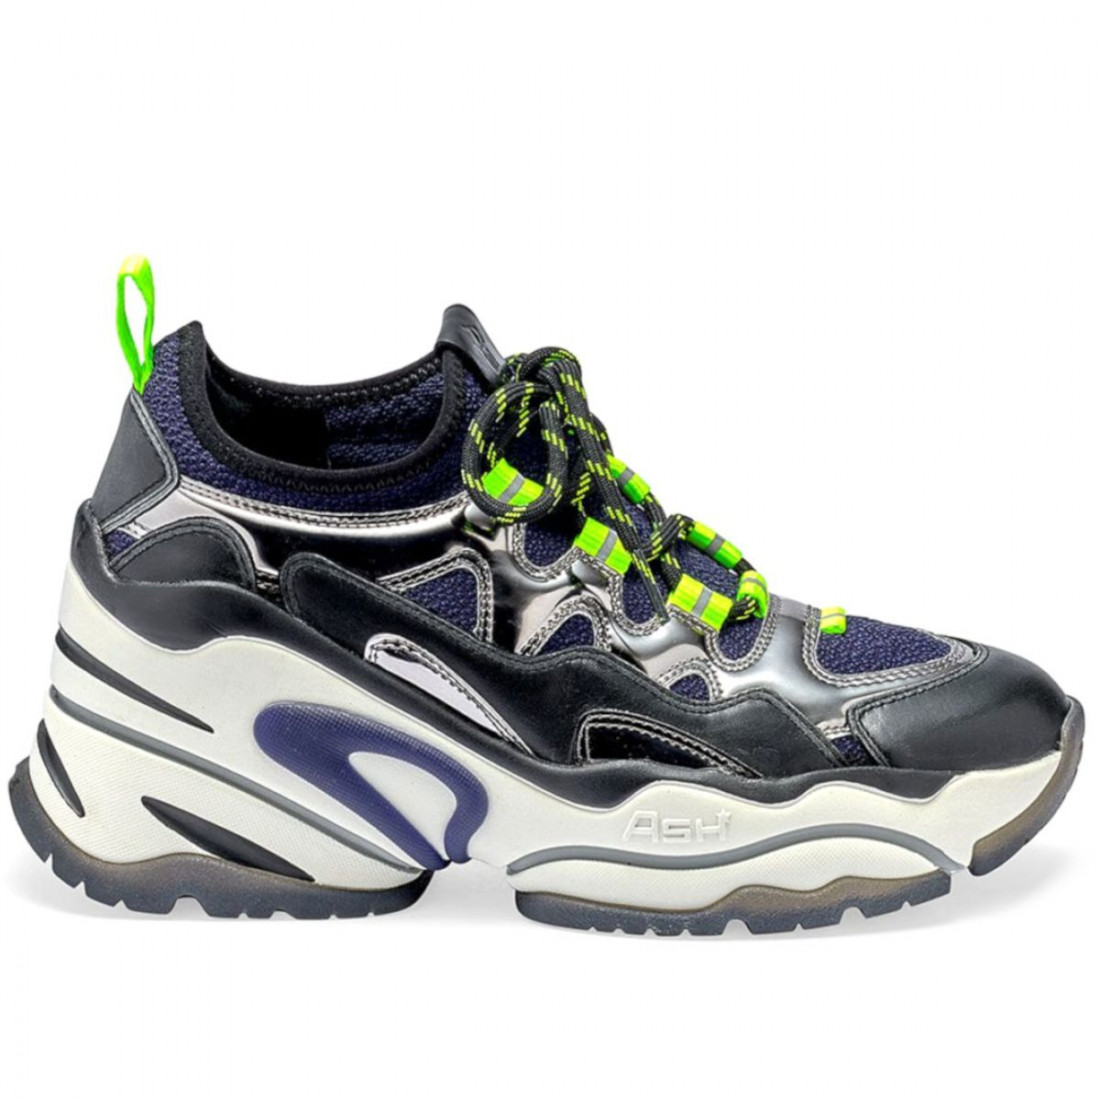 sneakers damen ash bird02 5147